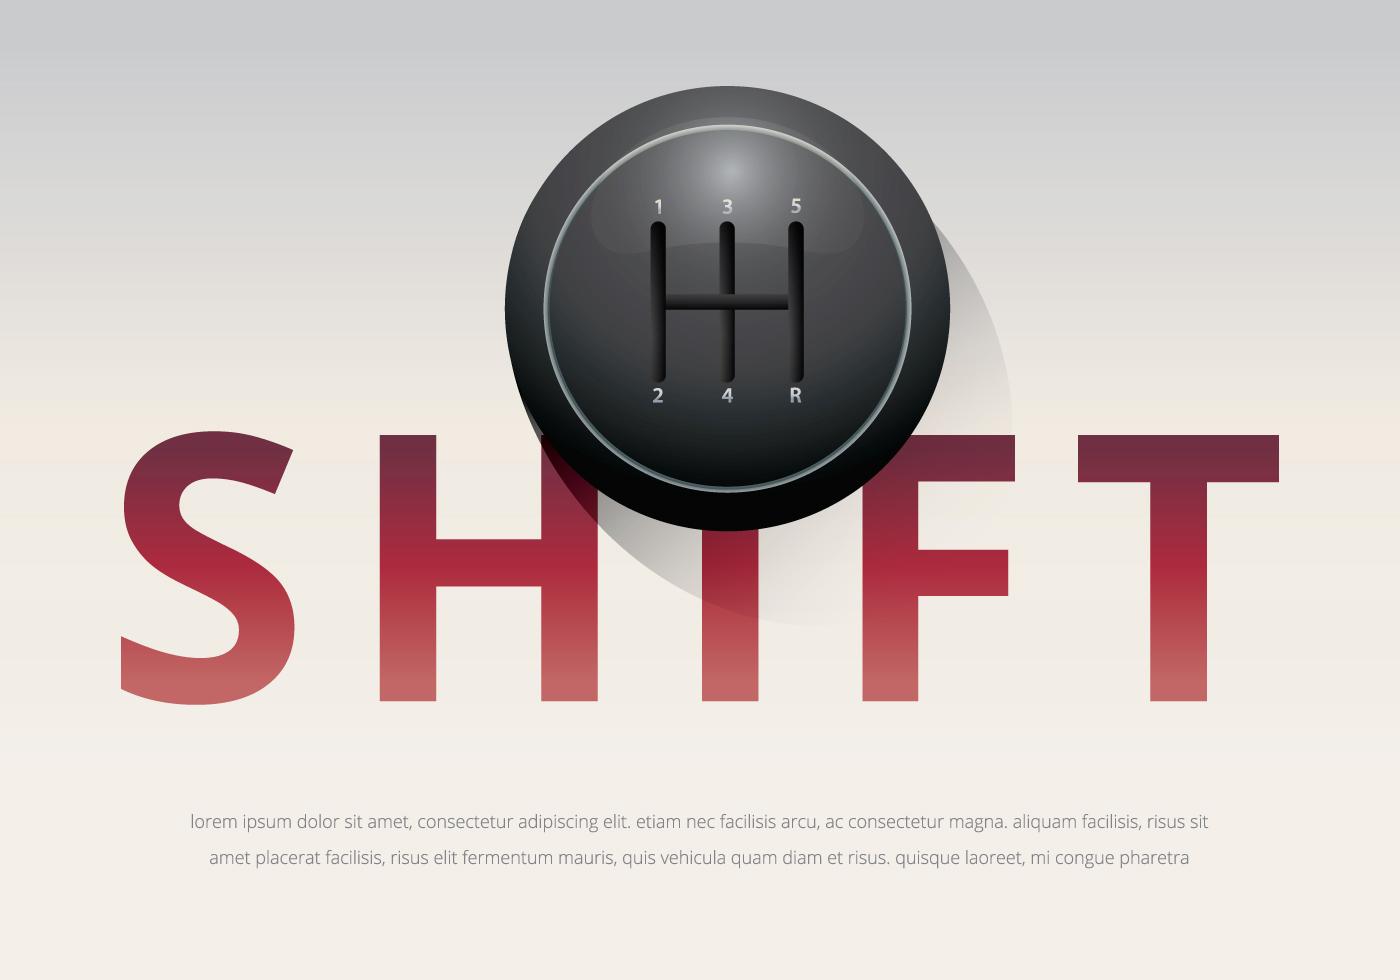 Gear Shift Knob Illustration Template Download Free